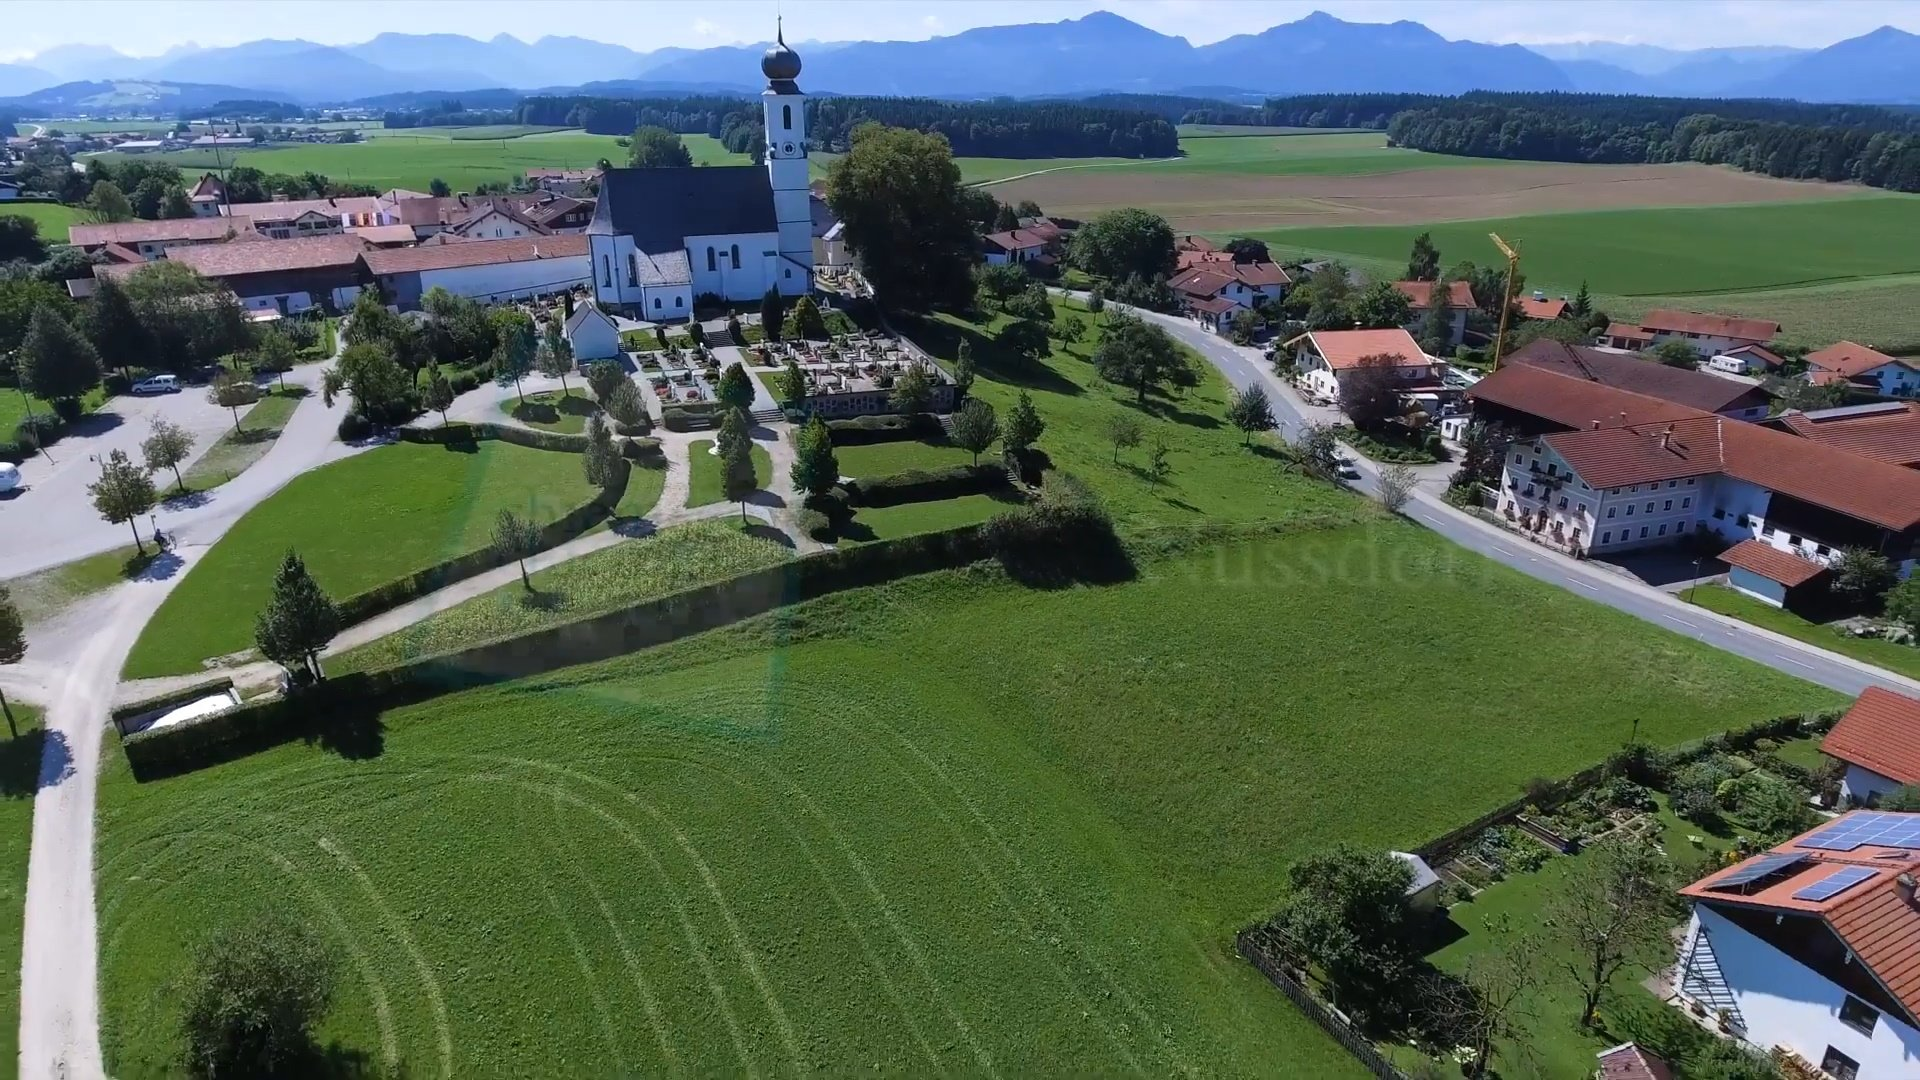 Nussdorf Chiemsee-Chiemgau Drohnenaufnahme